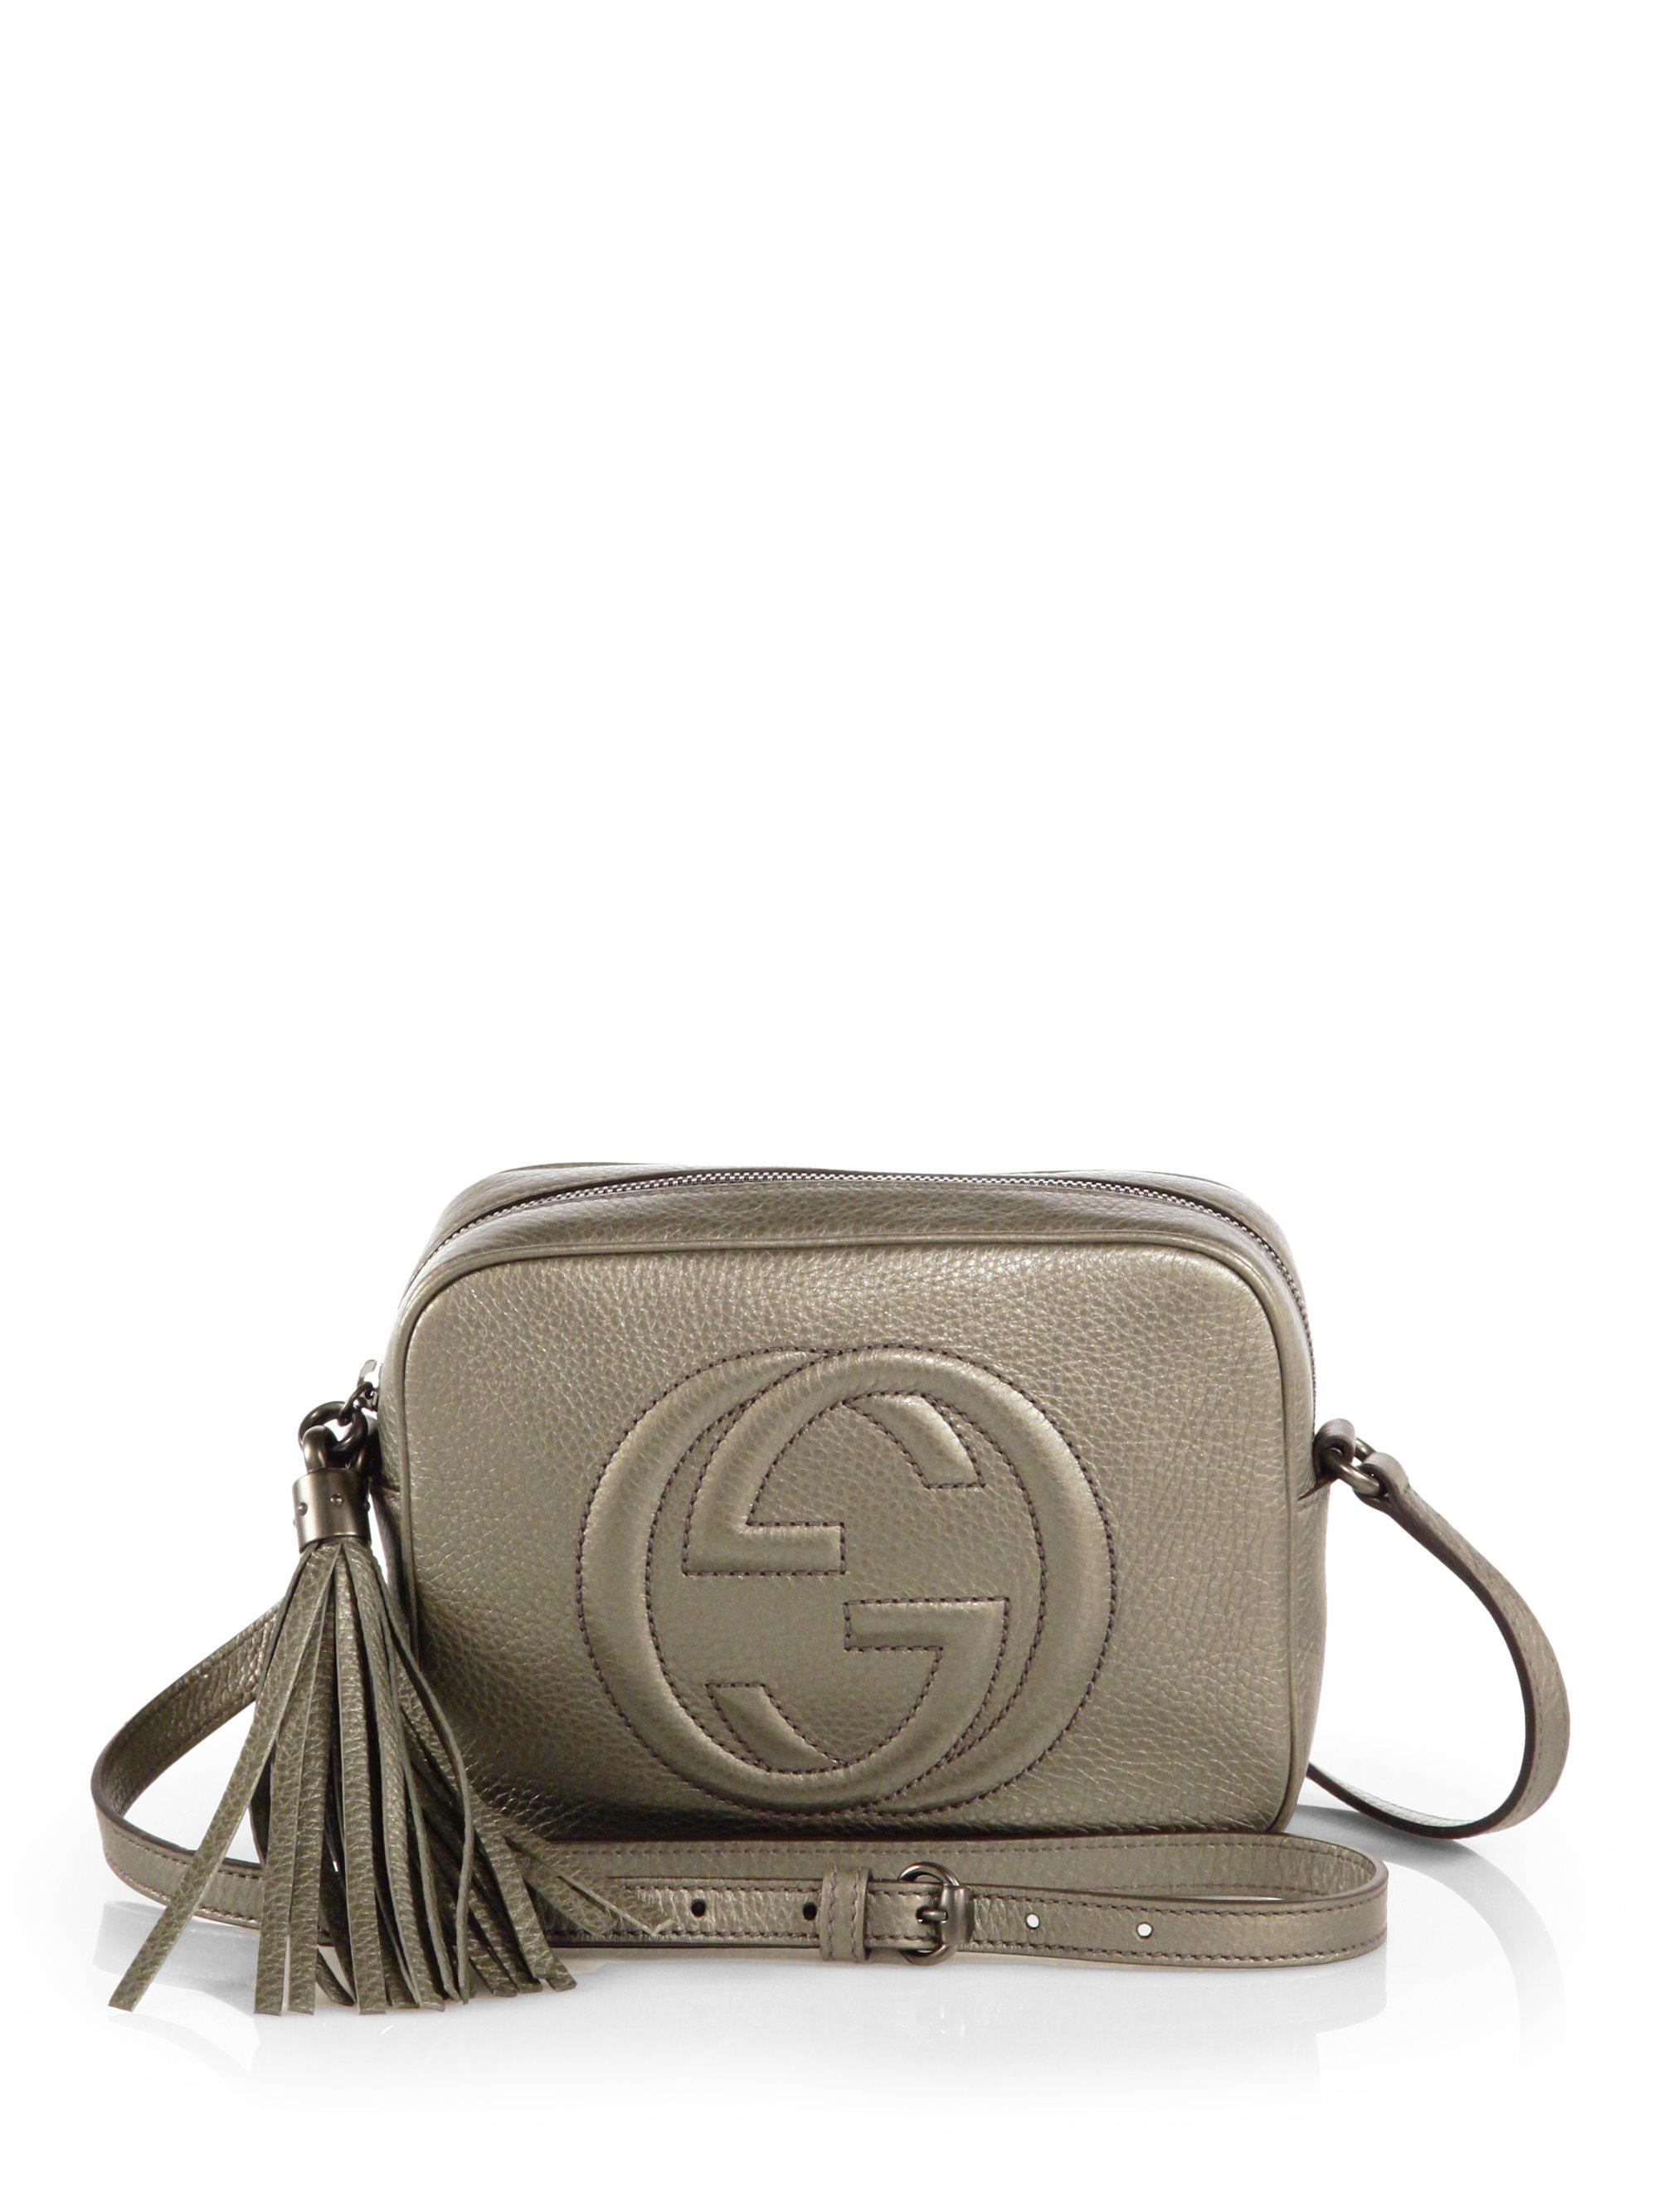 26e43ab7 Gucci Soho Metallic Leather Disco Bag